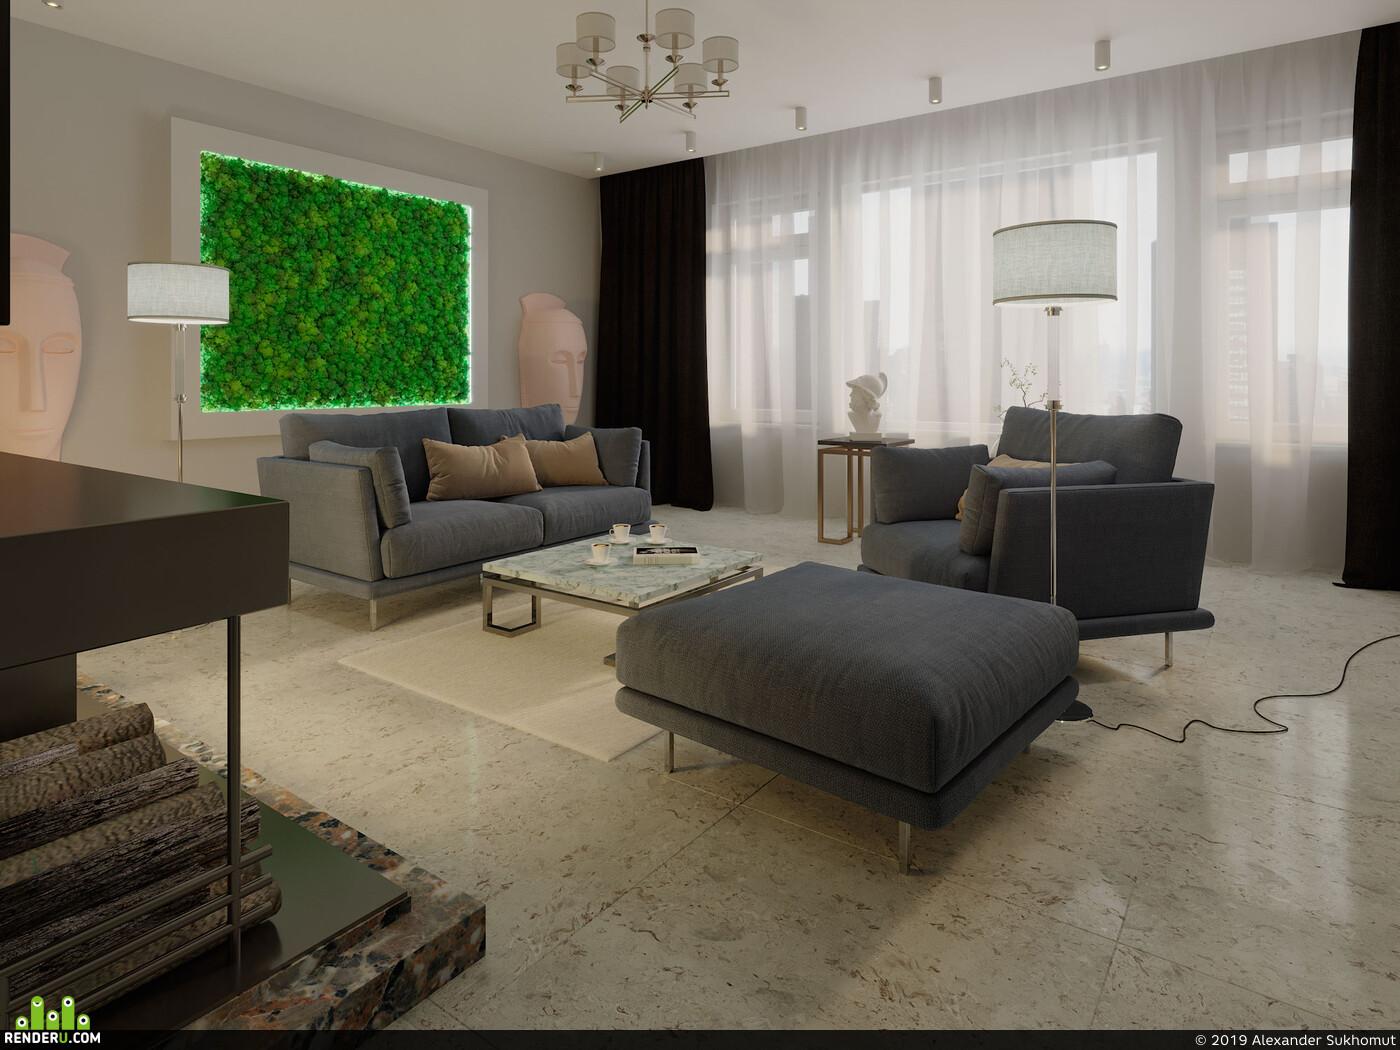 3ds max, 3D архитектура, дизайн интерьера